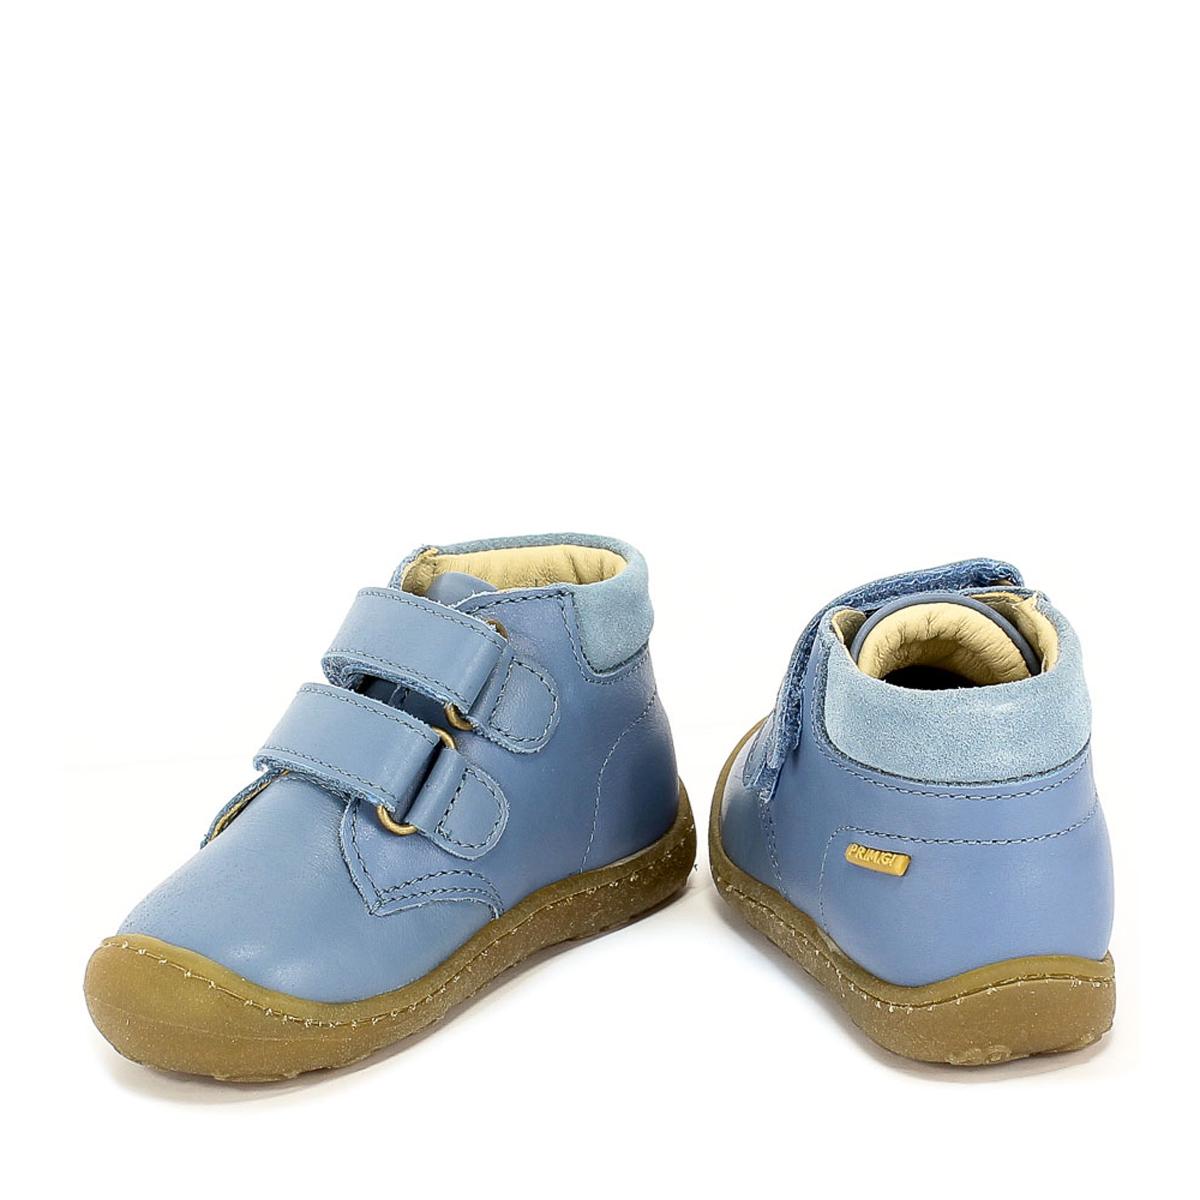 Primigi do nauki chodzenia buciki do nauki chodzenia primigi dla dzieci primigi online primigi kraków